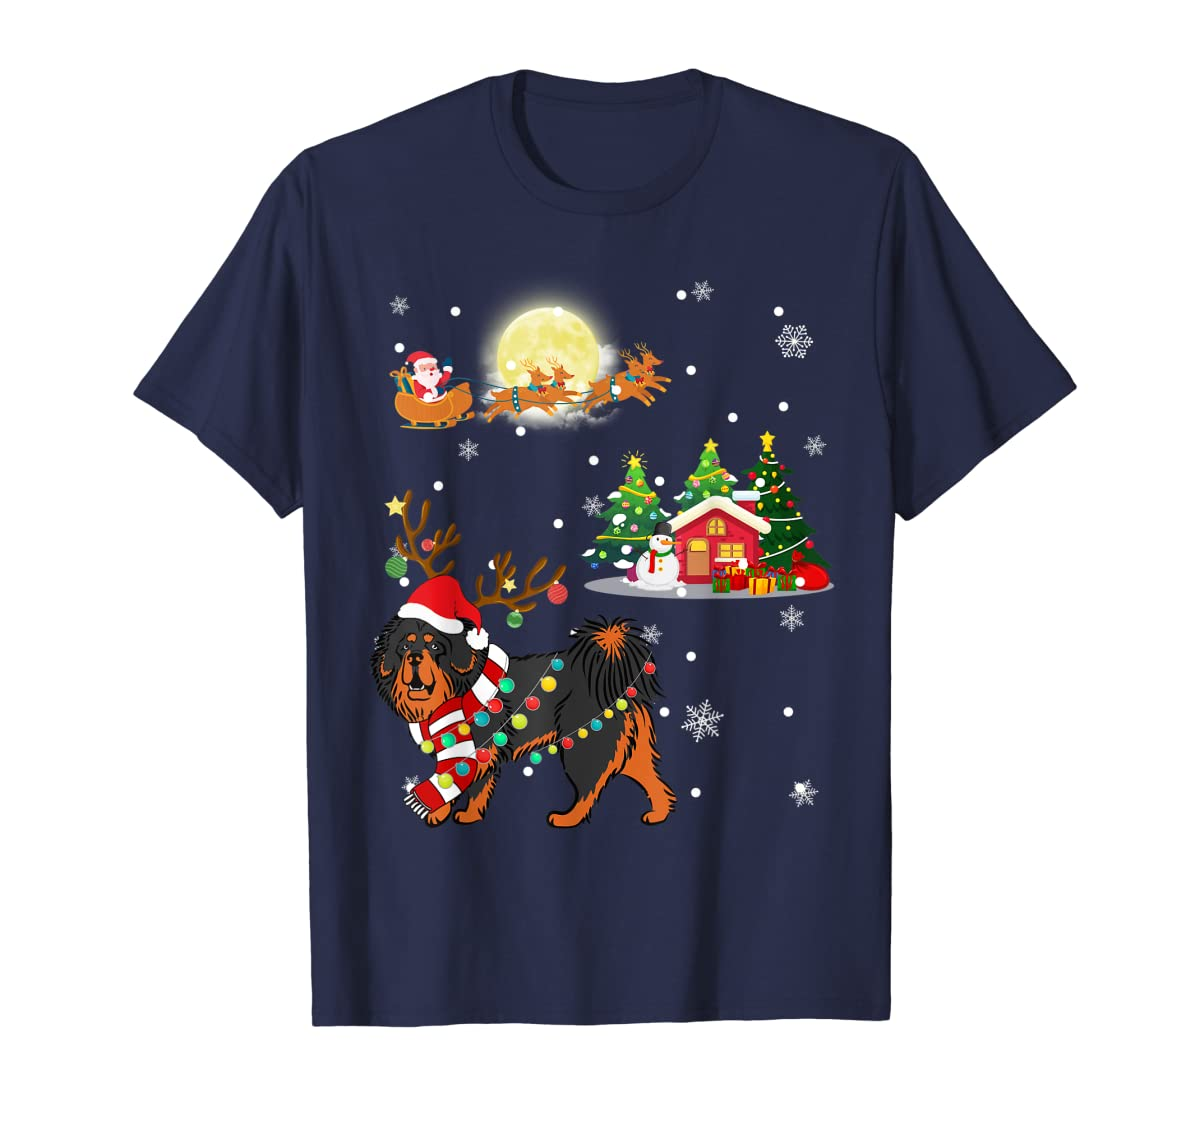 Tibetan Mastiff Dog Led Light Christmas 2019 Gift T-Shirt-Men's T-Shirt-Navy